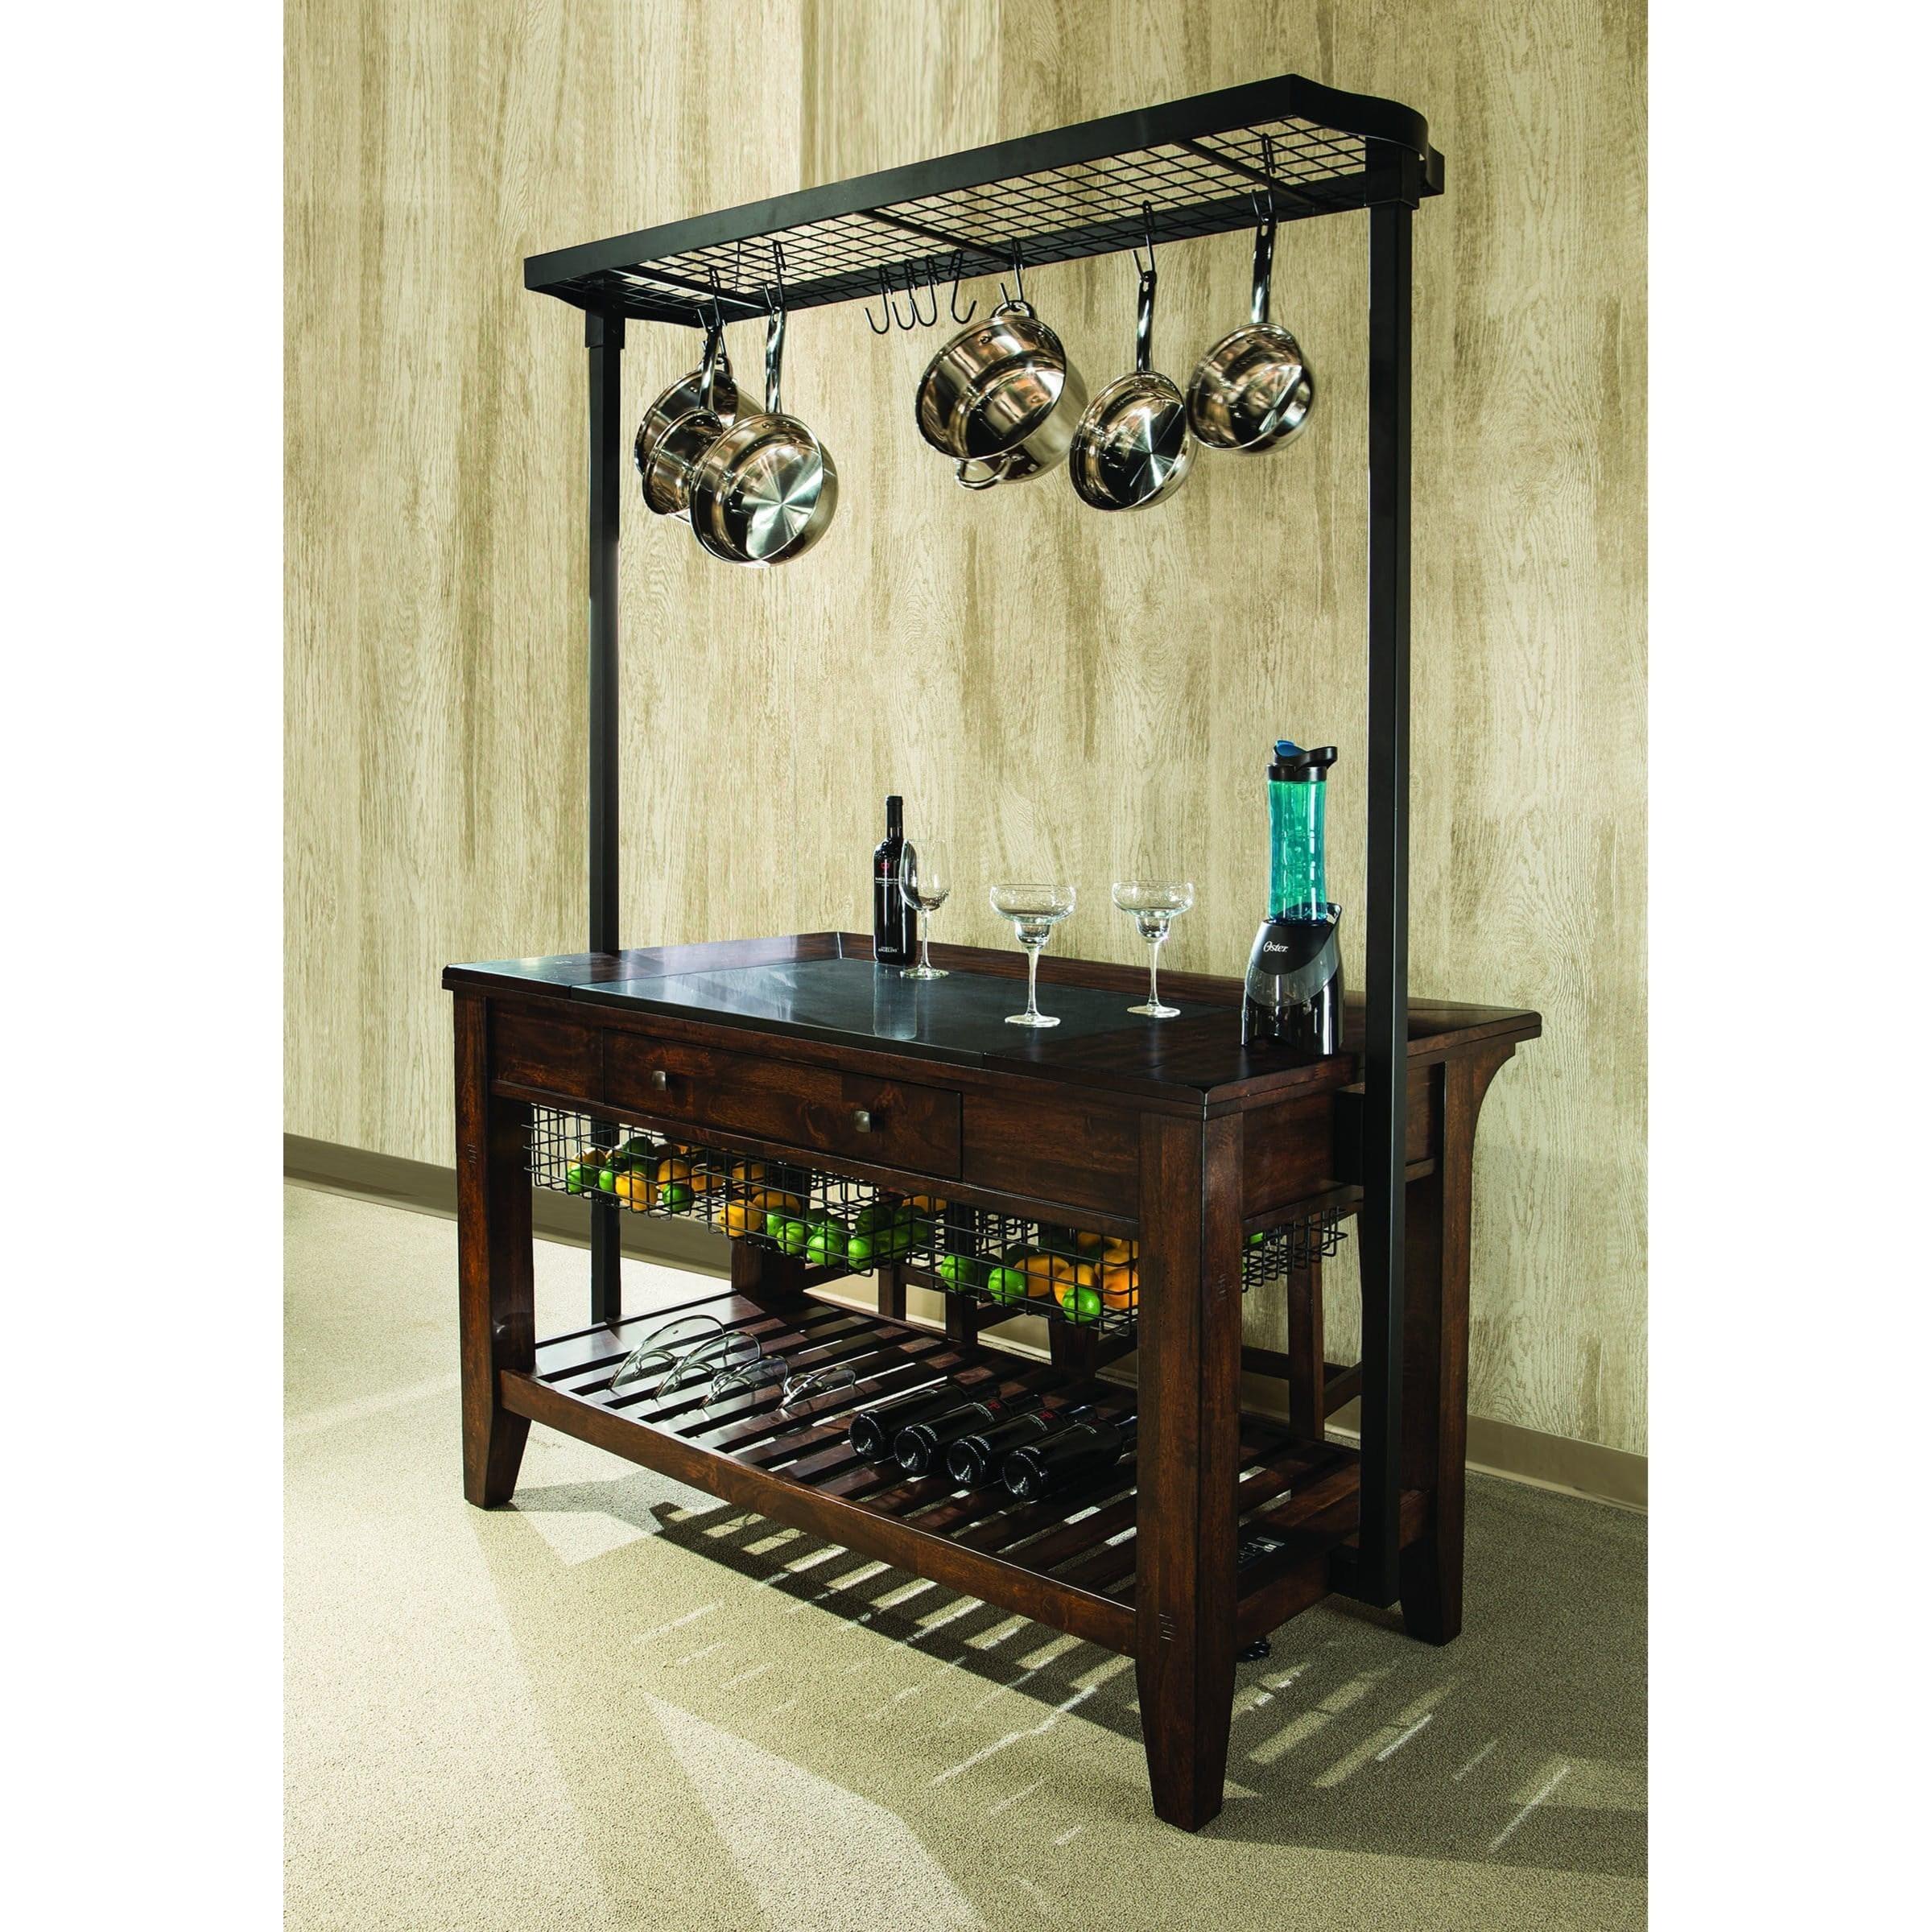 Intercon Kona Kitchen Island With Metal Pot Rack And Wine Storage Sheely S Furniture Appliance Kitchen Islands